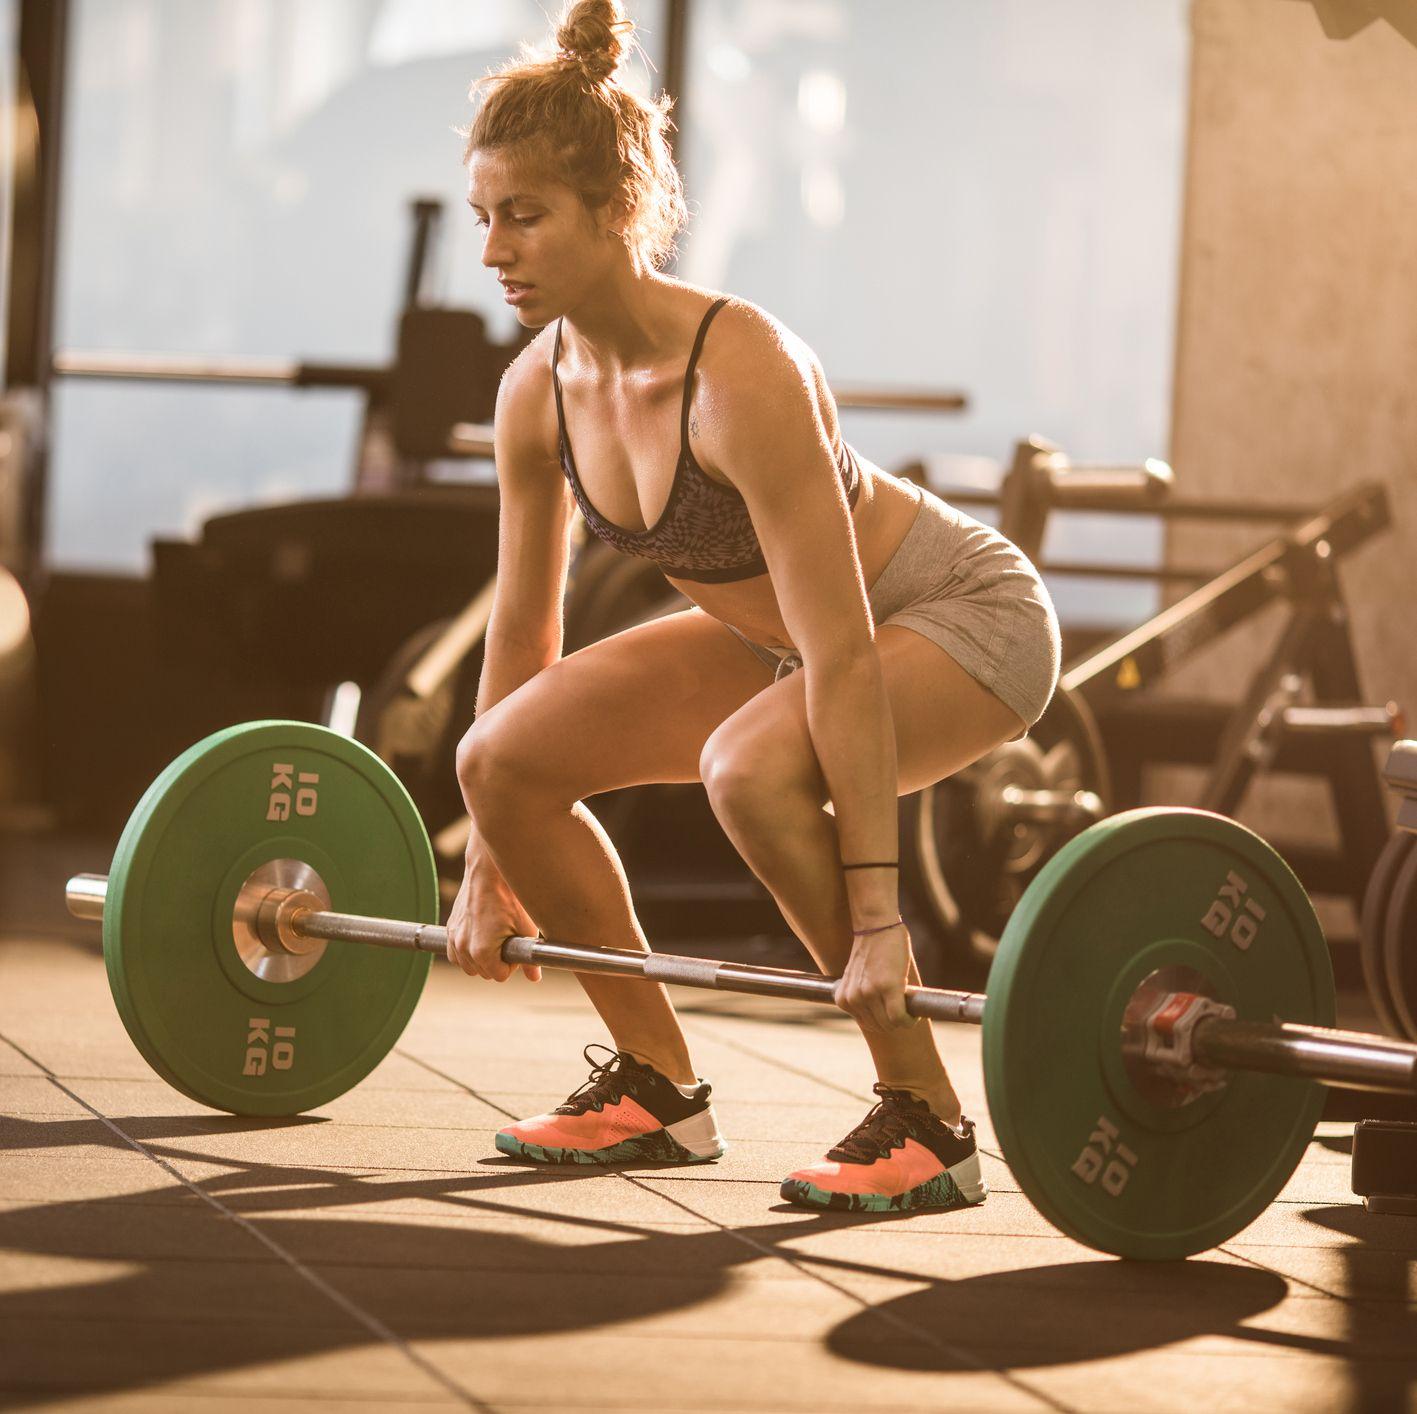 Female athlete preparing for a deadlift in a health club.